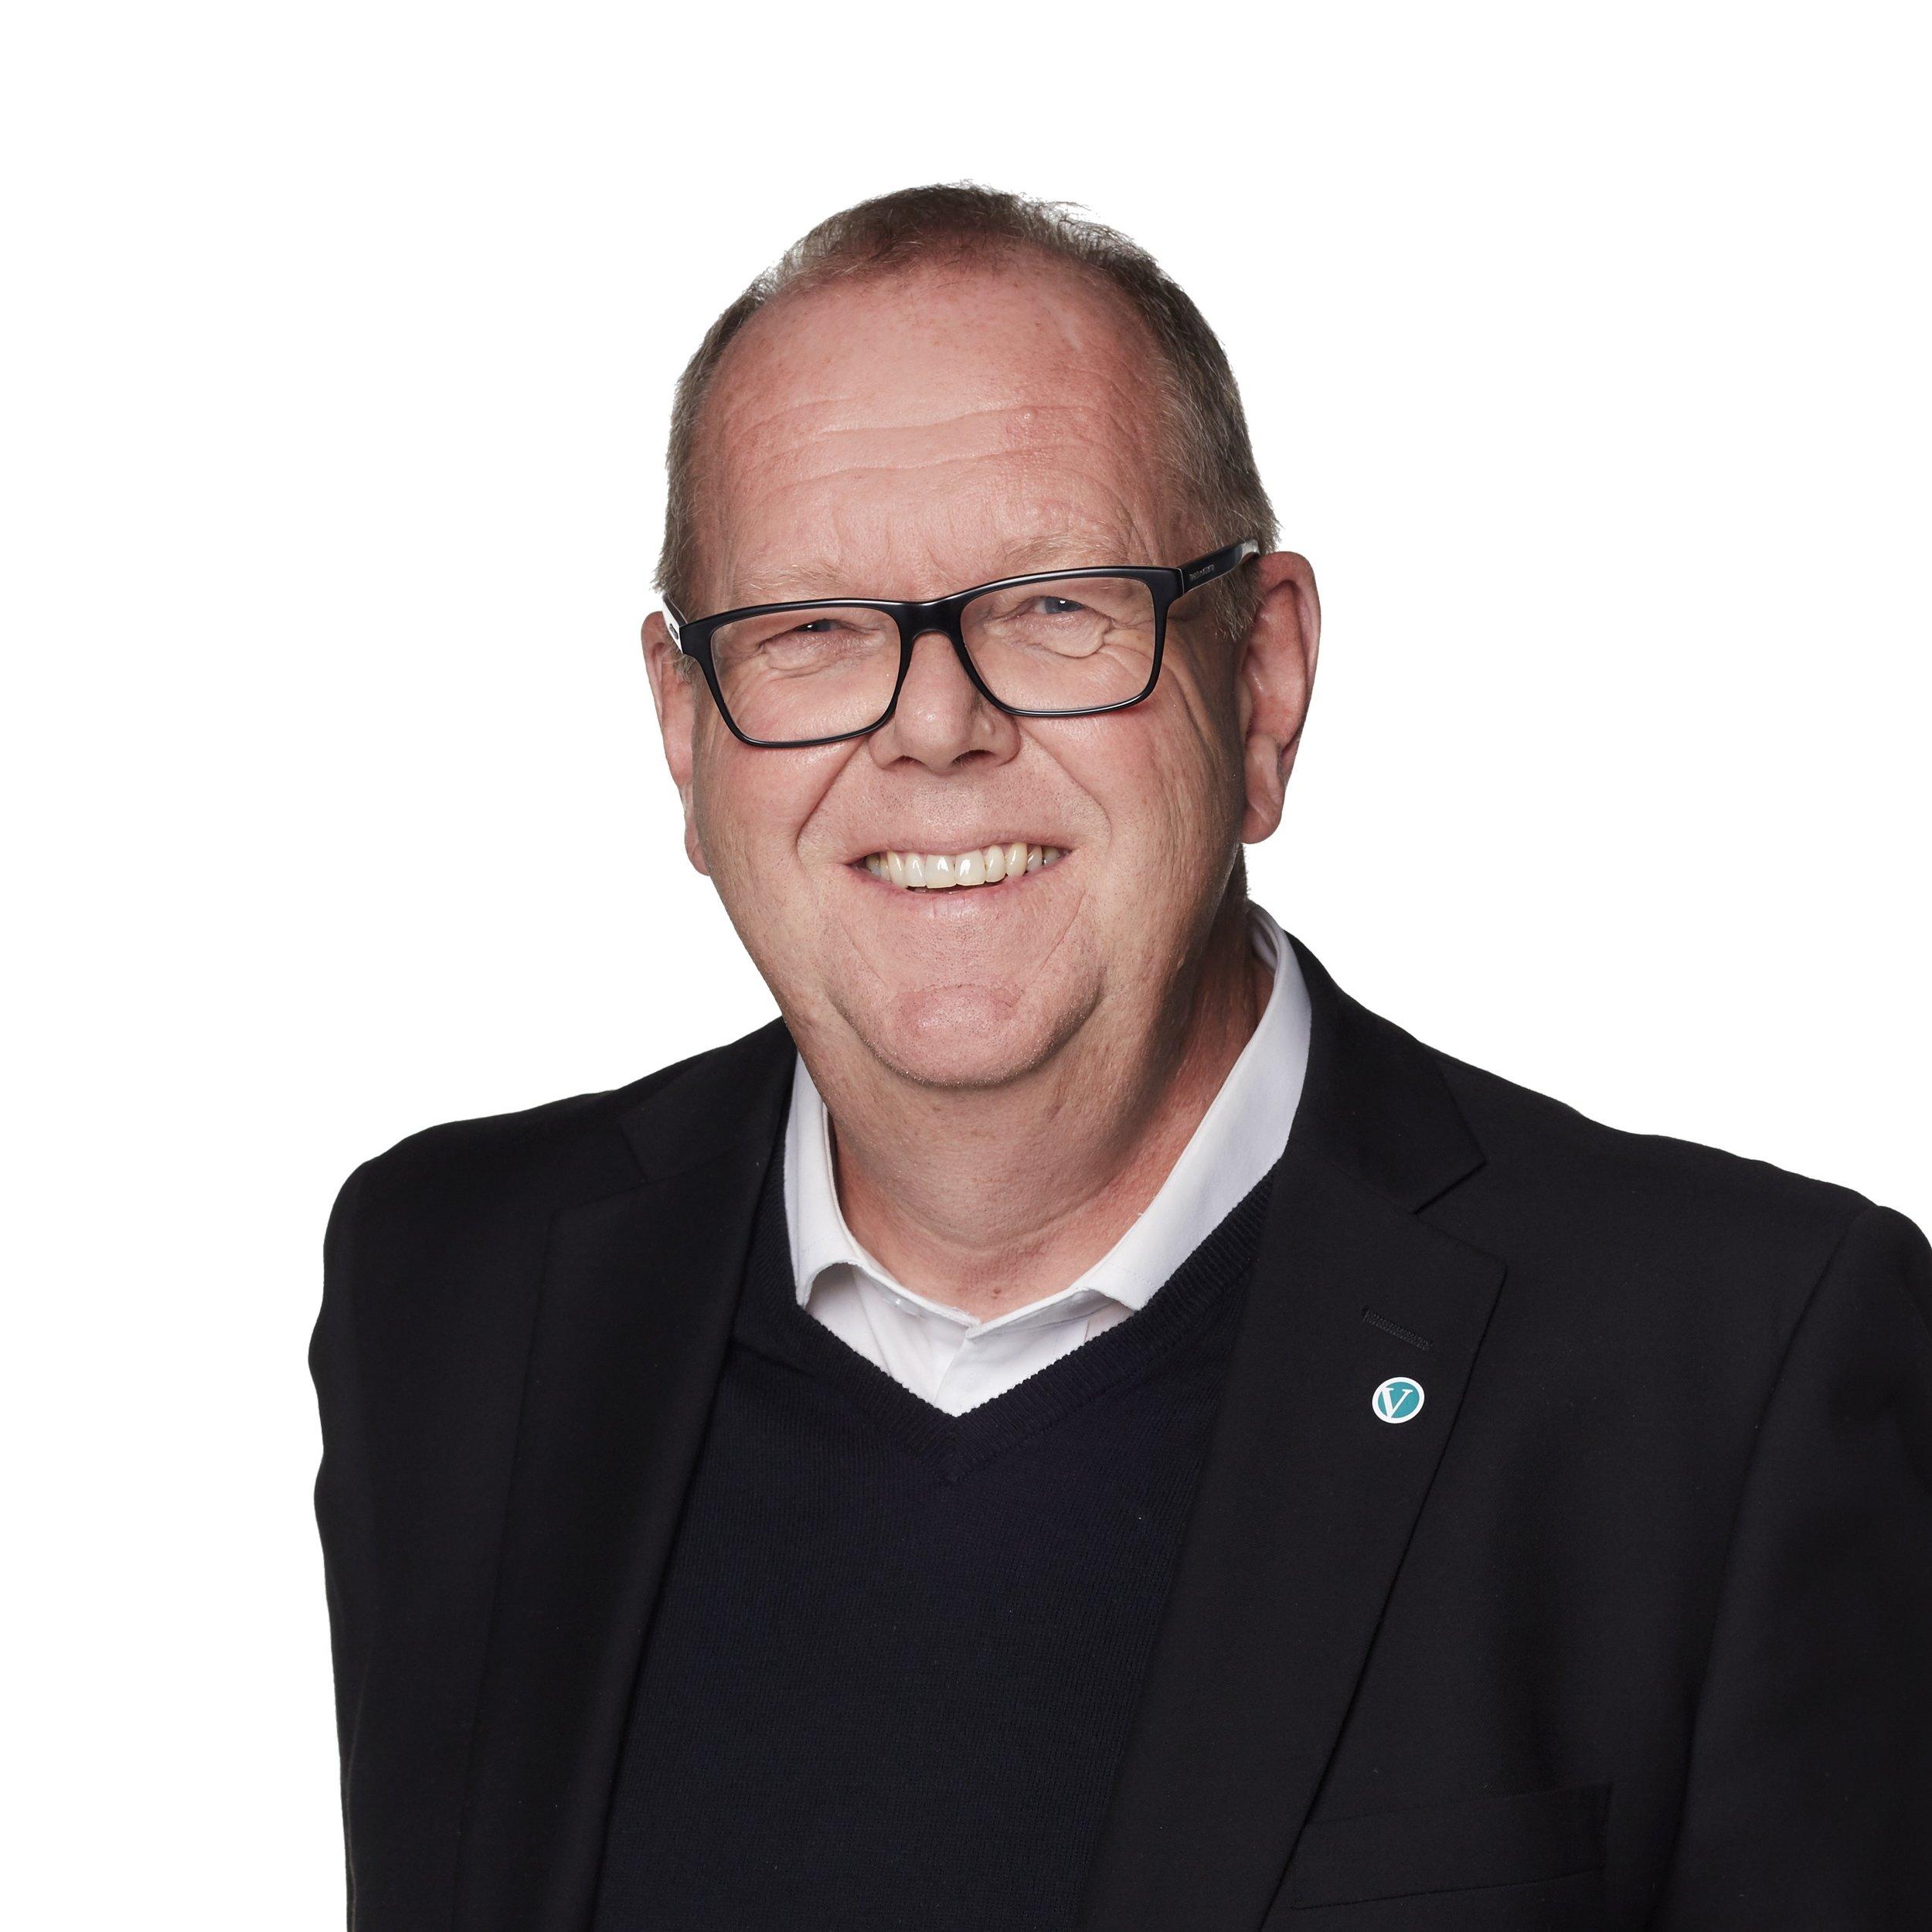 Pål Farstad - nye reiselivsdirektør for Nordmøre og Romsdal.      Foto: Venstre